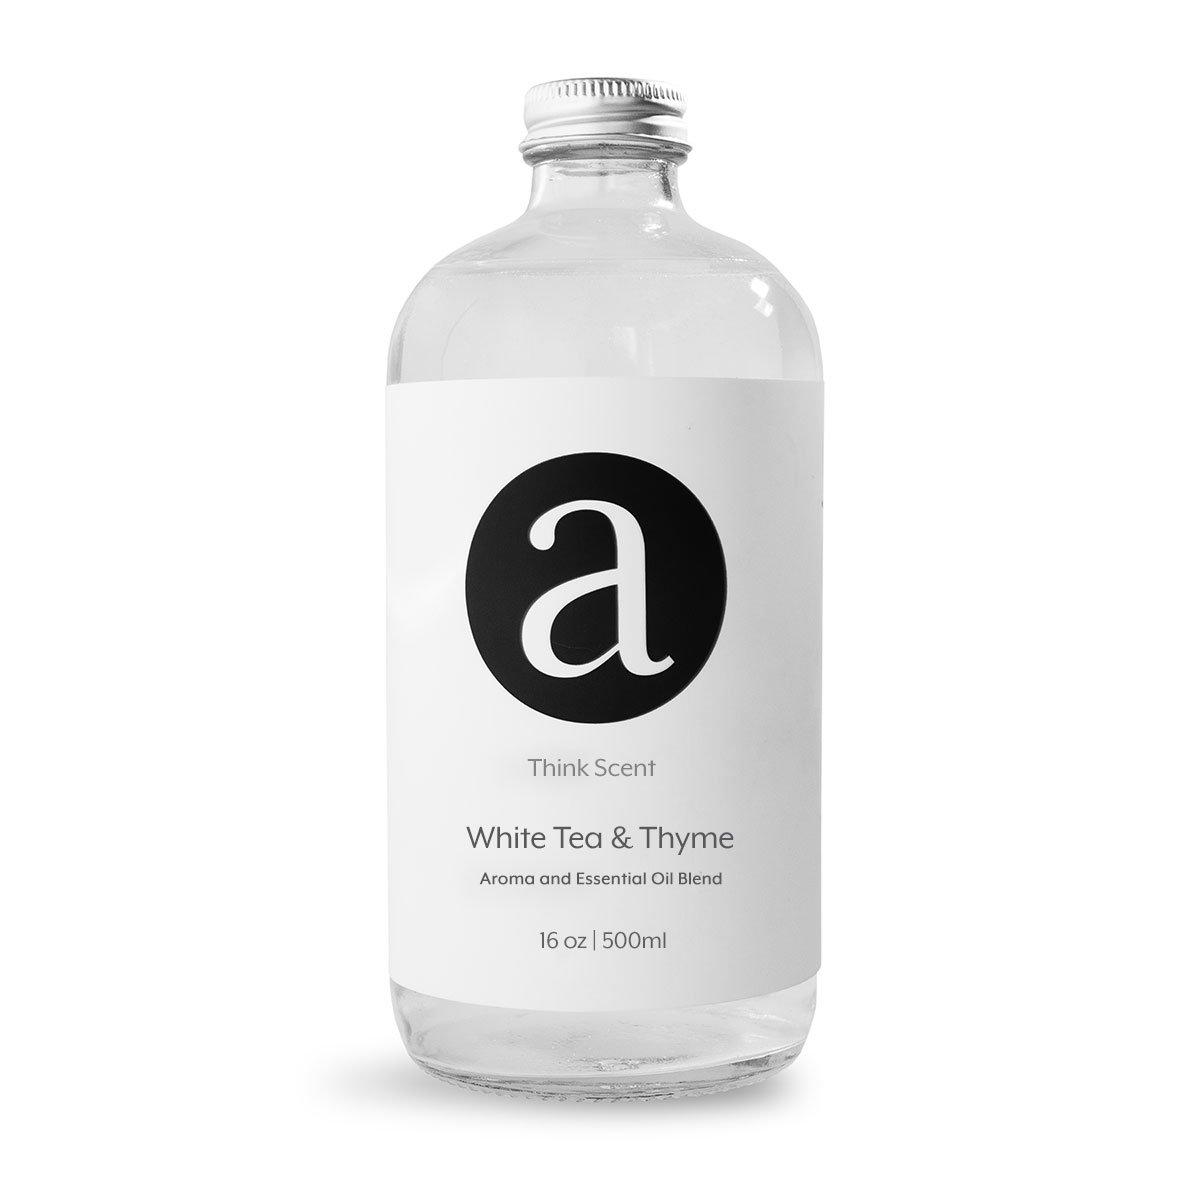 (White Tea & Thyme) Aroma / Fragrance Oil For AromaTech Air Freshener Scent Diffuser (500ml)